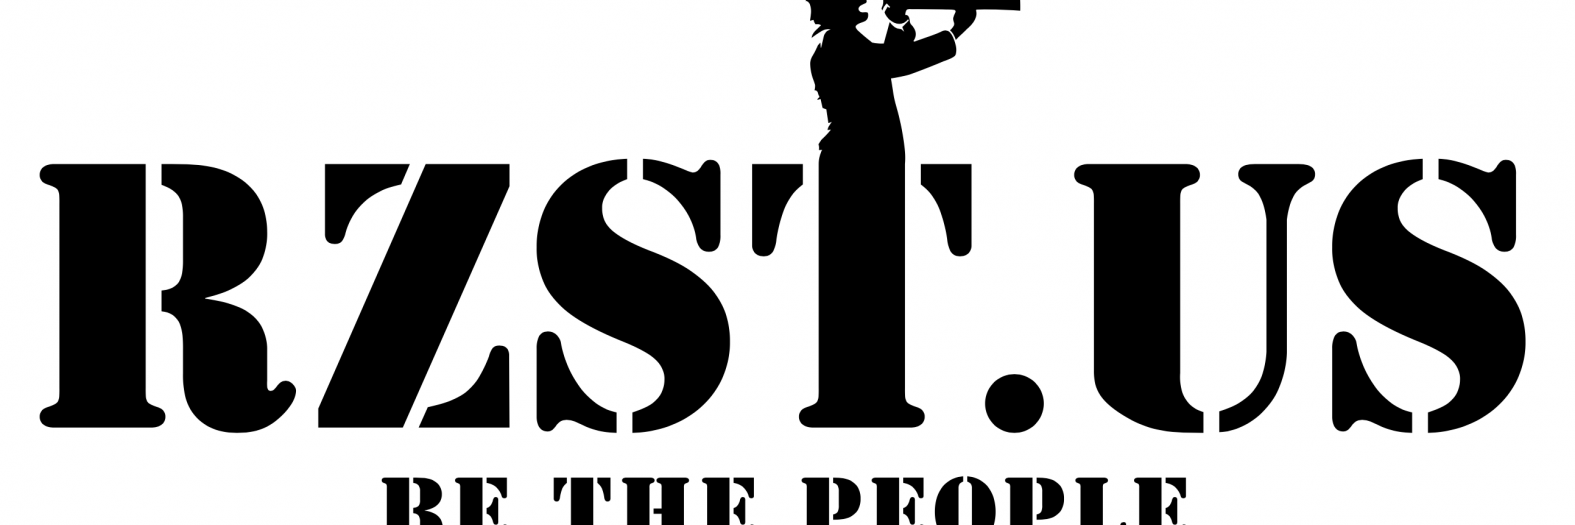 RZST Logo with Slogan